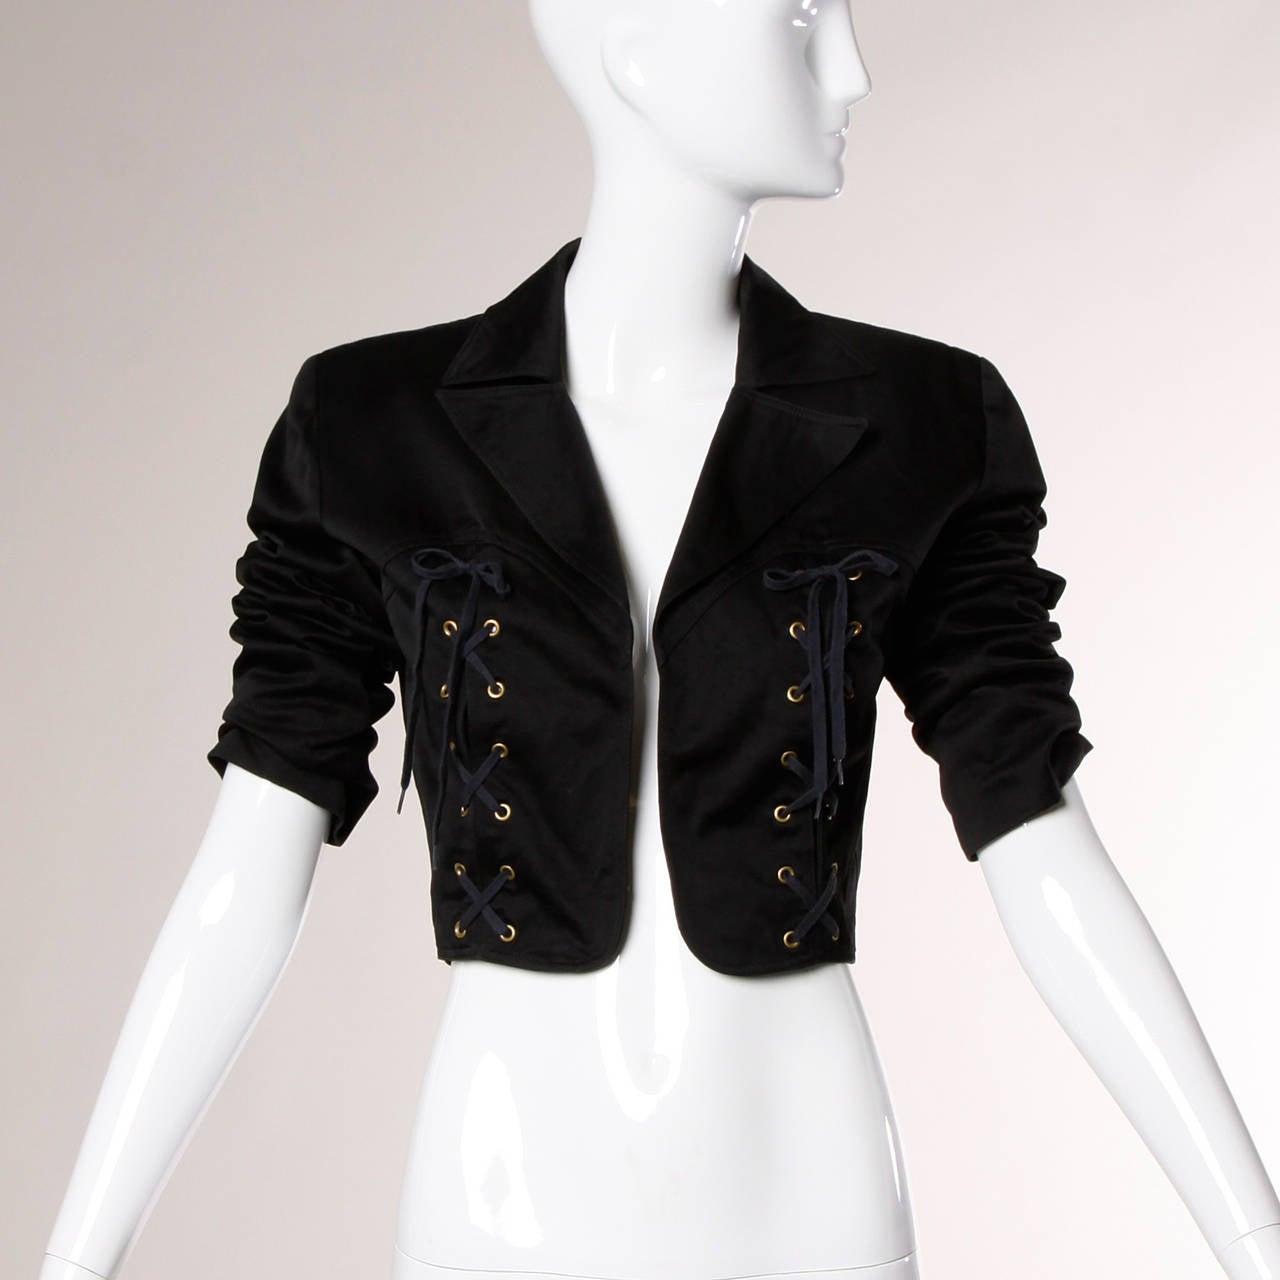 Patrick Kelly Vintage Black Lace Up Grommet Jacket 7